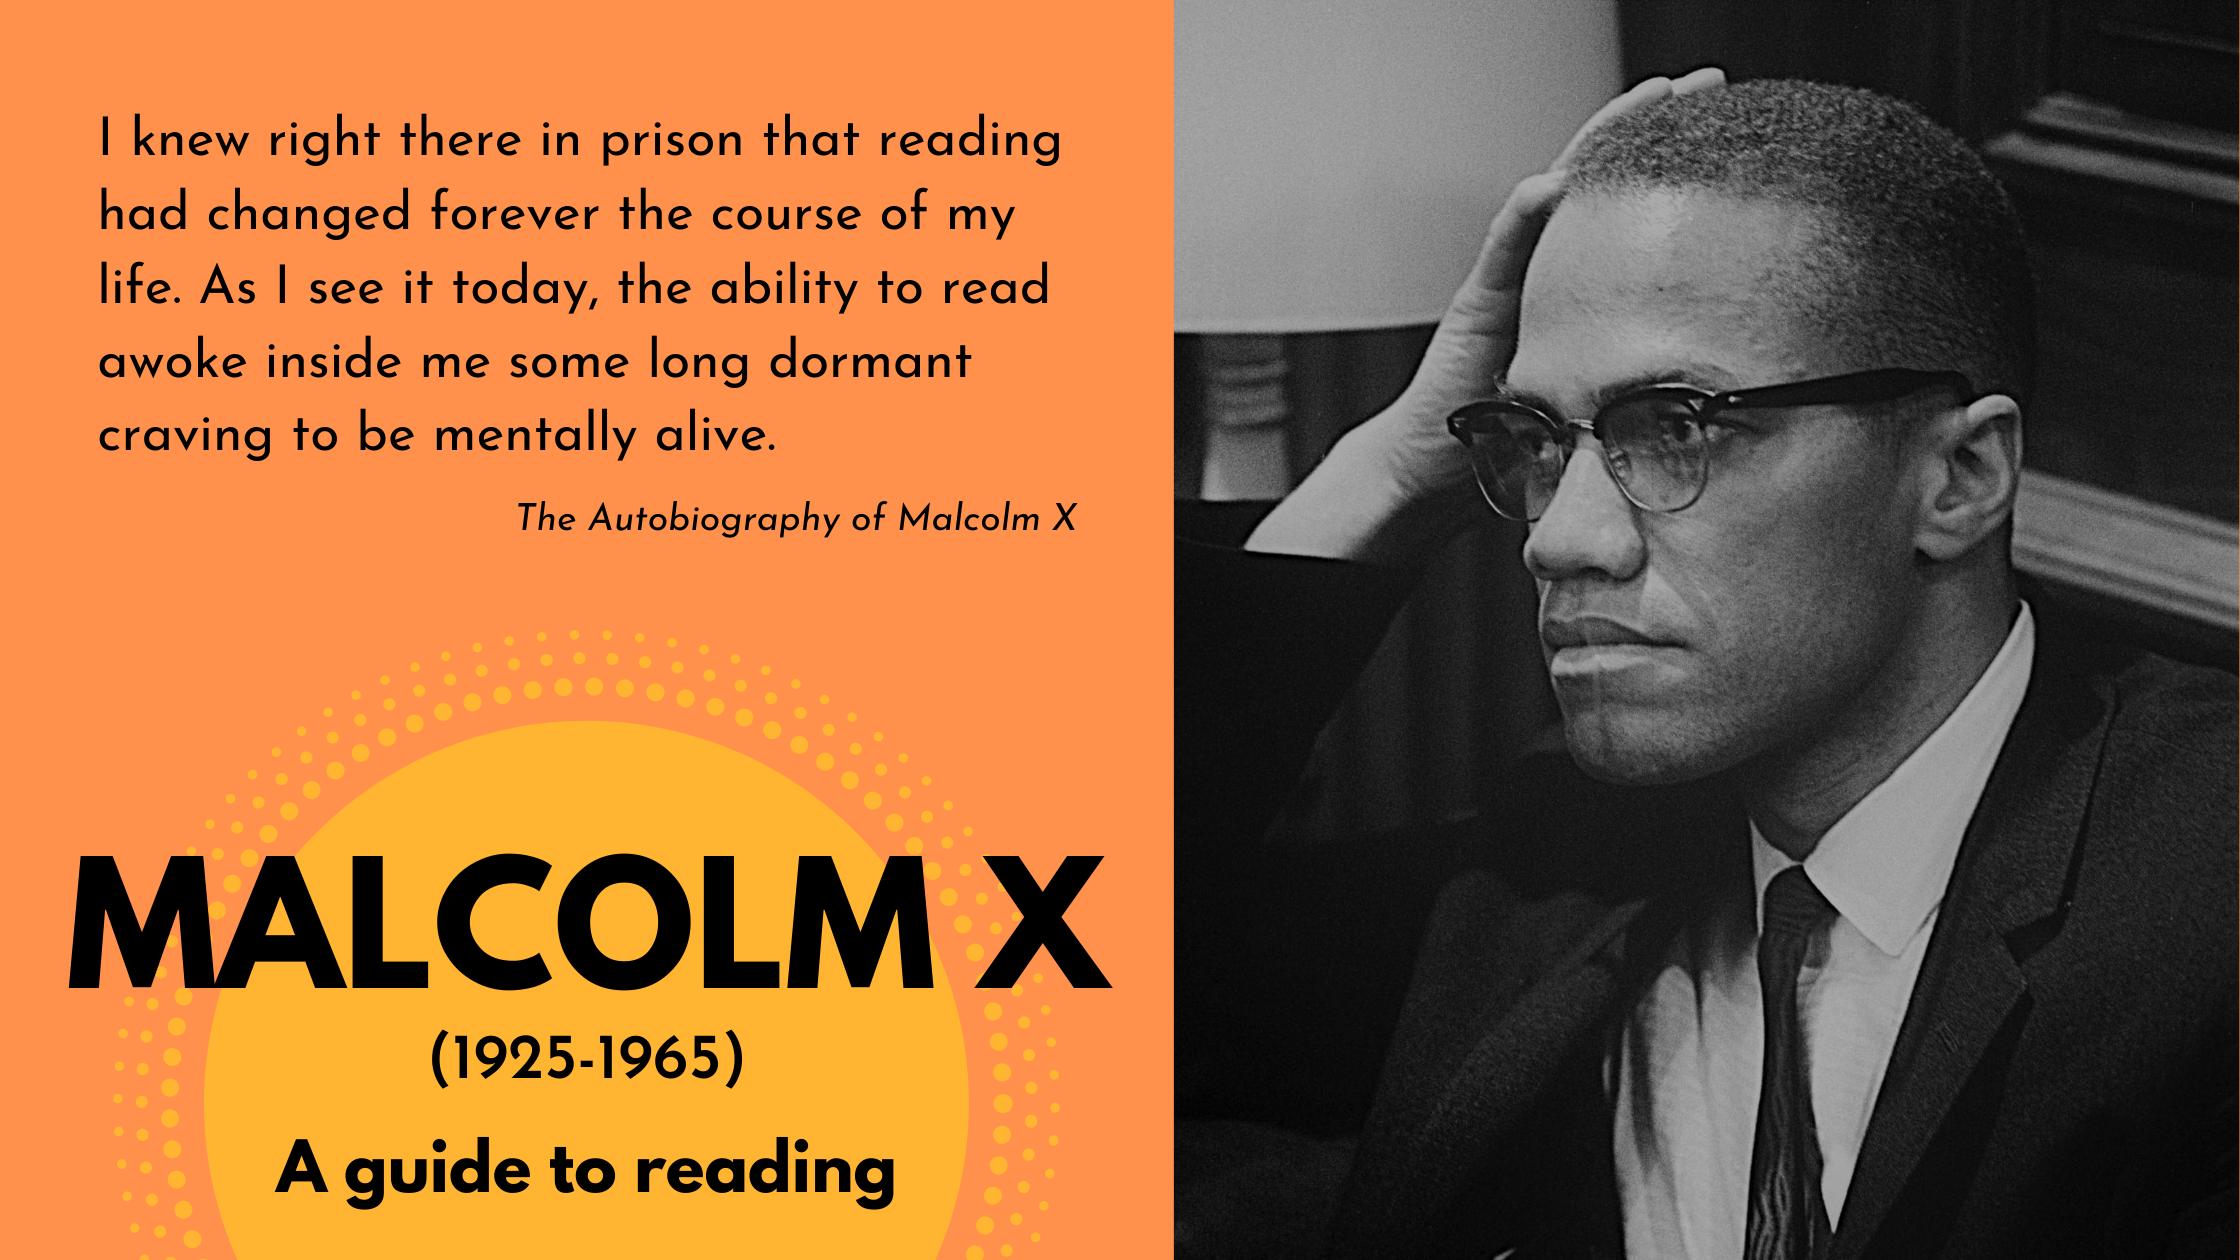 Malcolm X guide splash image